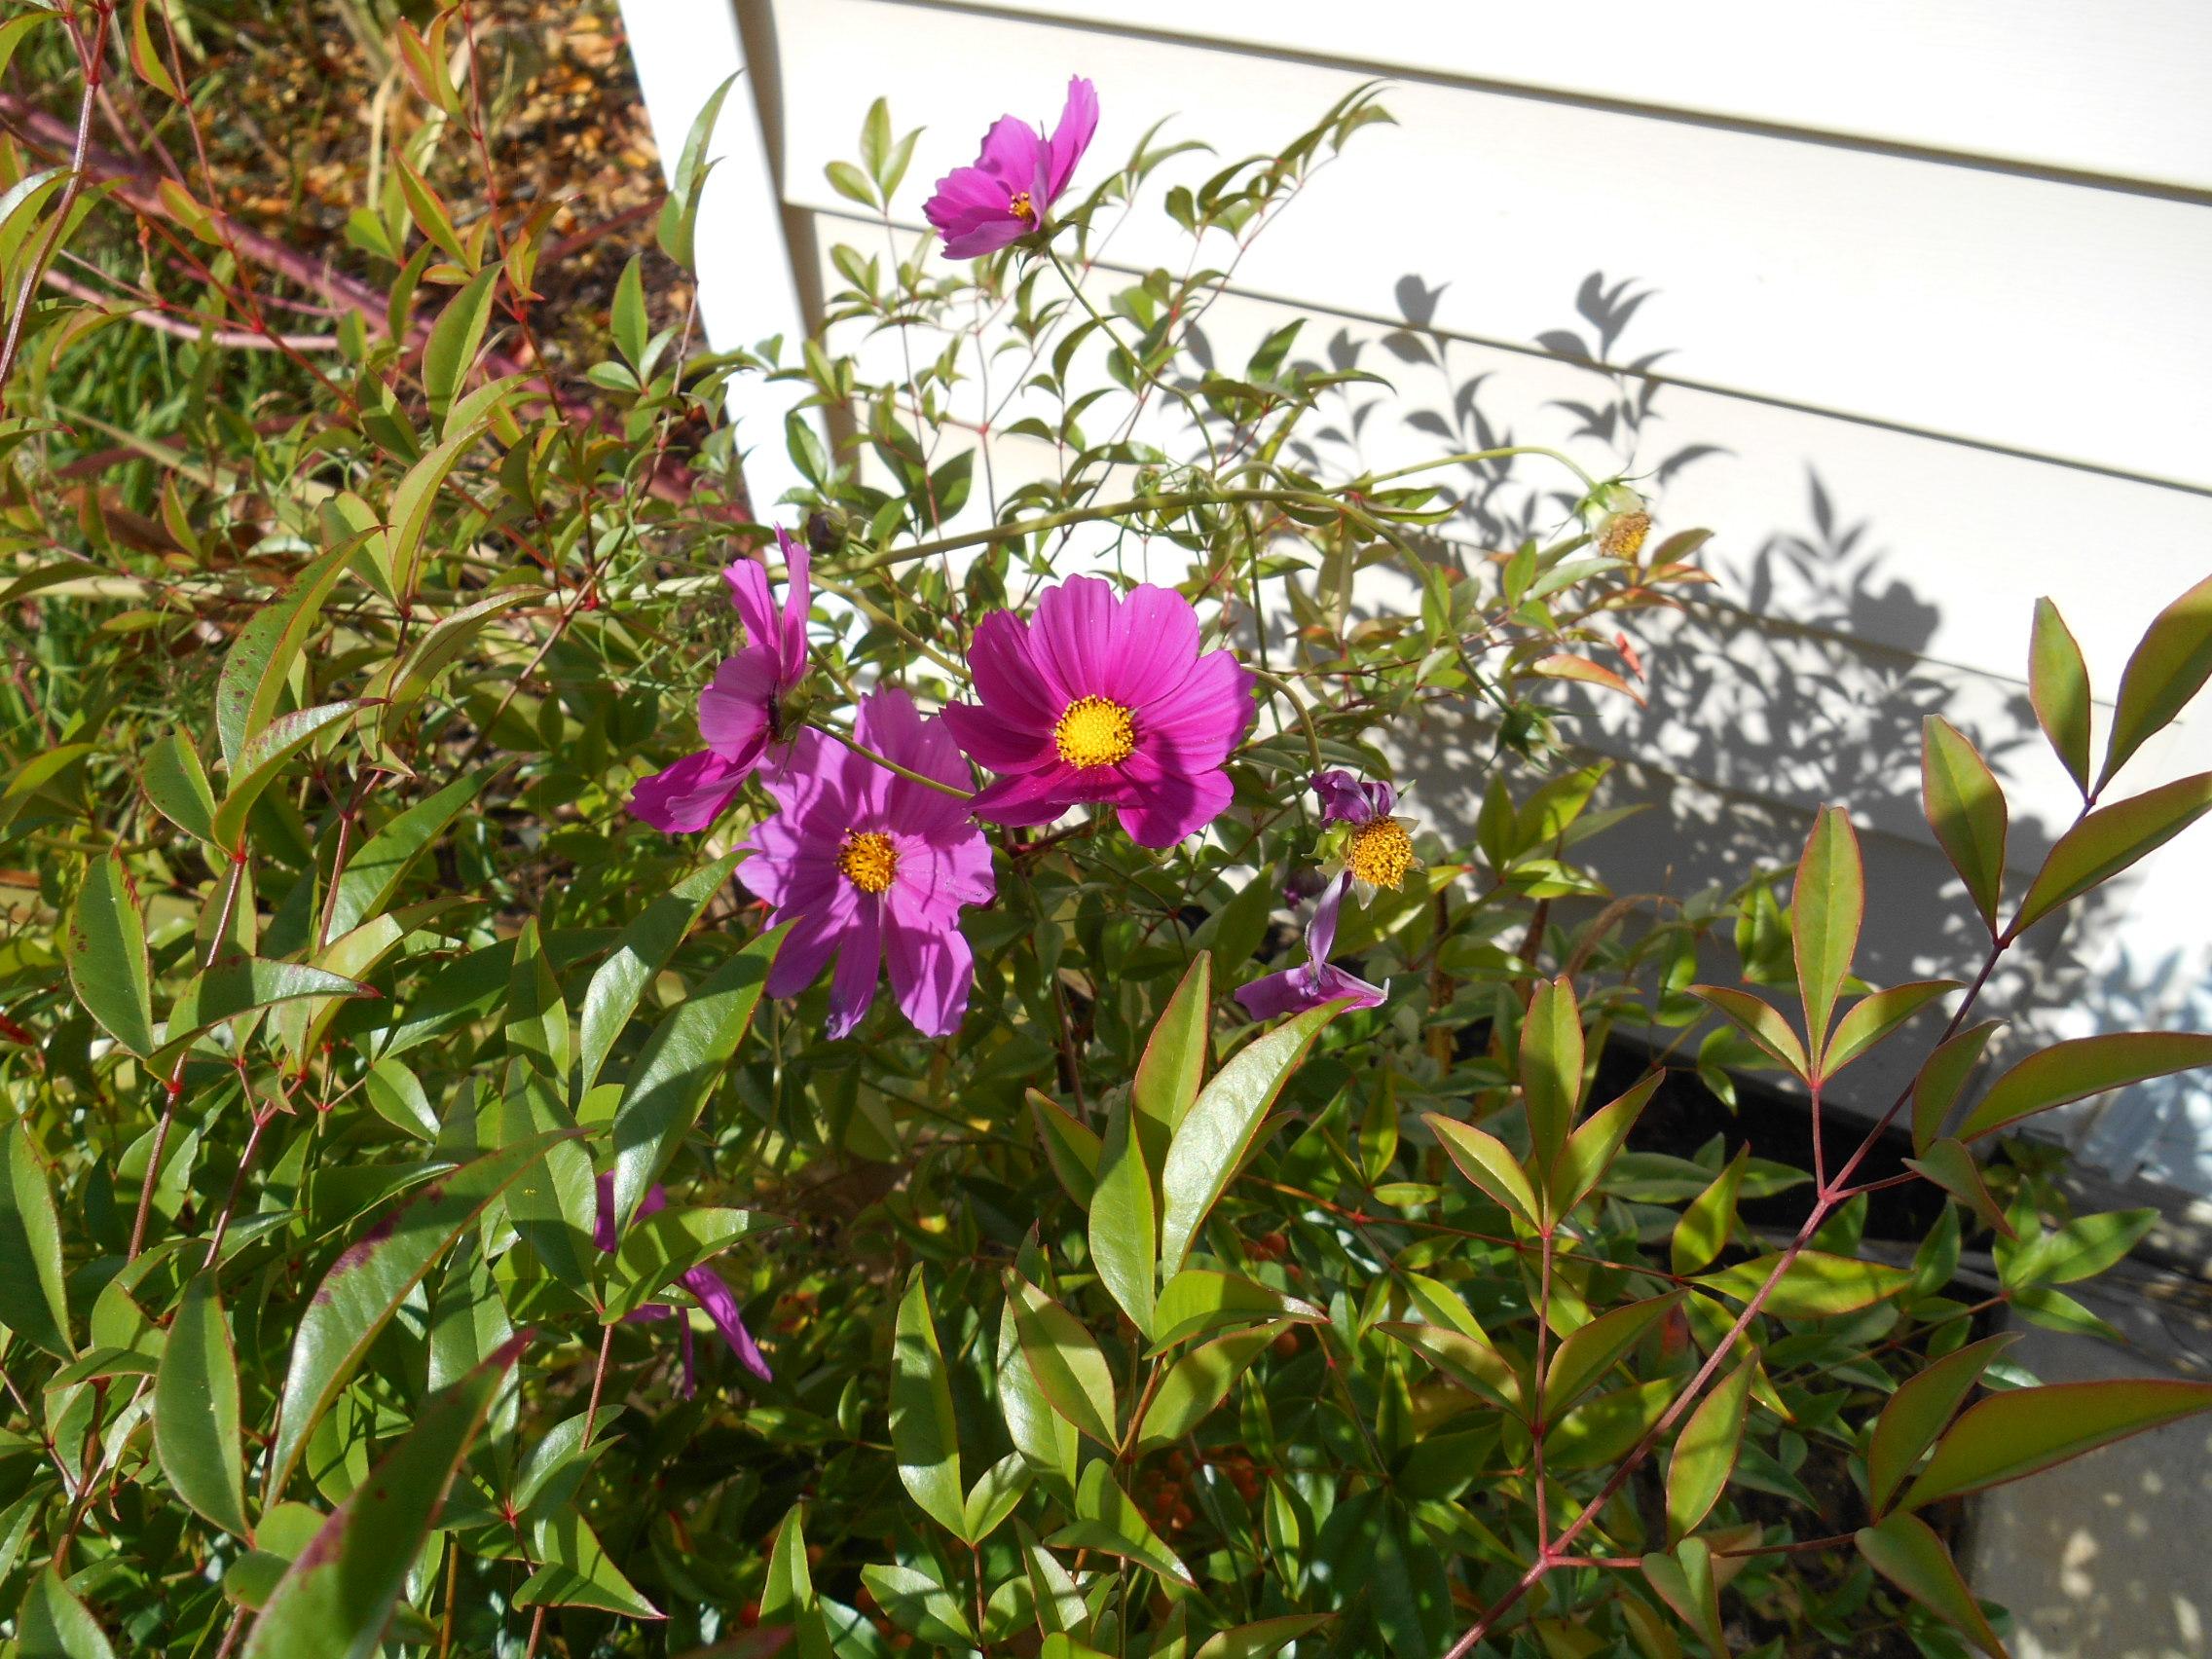 oct 18 flowers 009.JPG